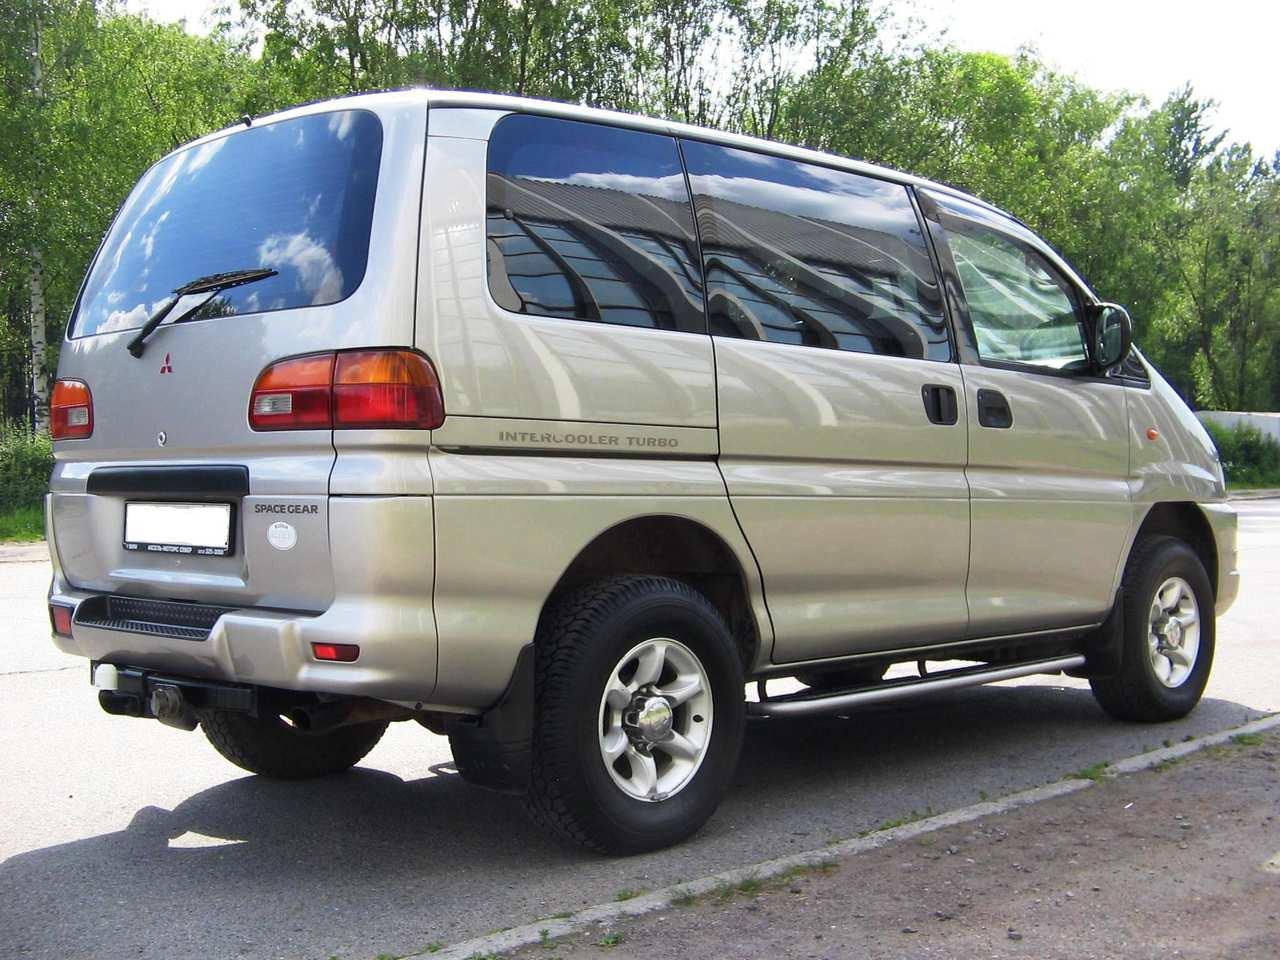 2000 Mitsubishi Space Gear Images 2500cc Diesel Manual